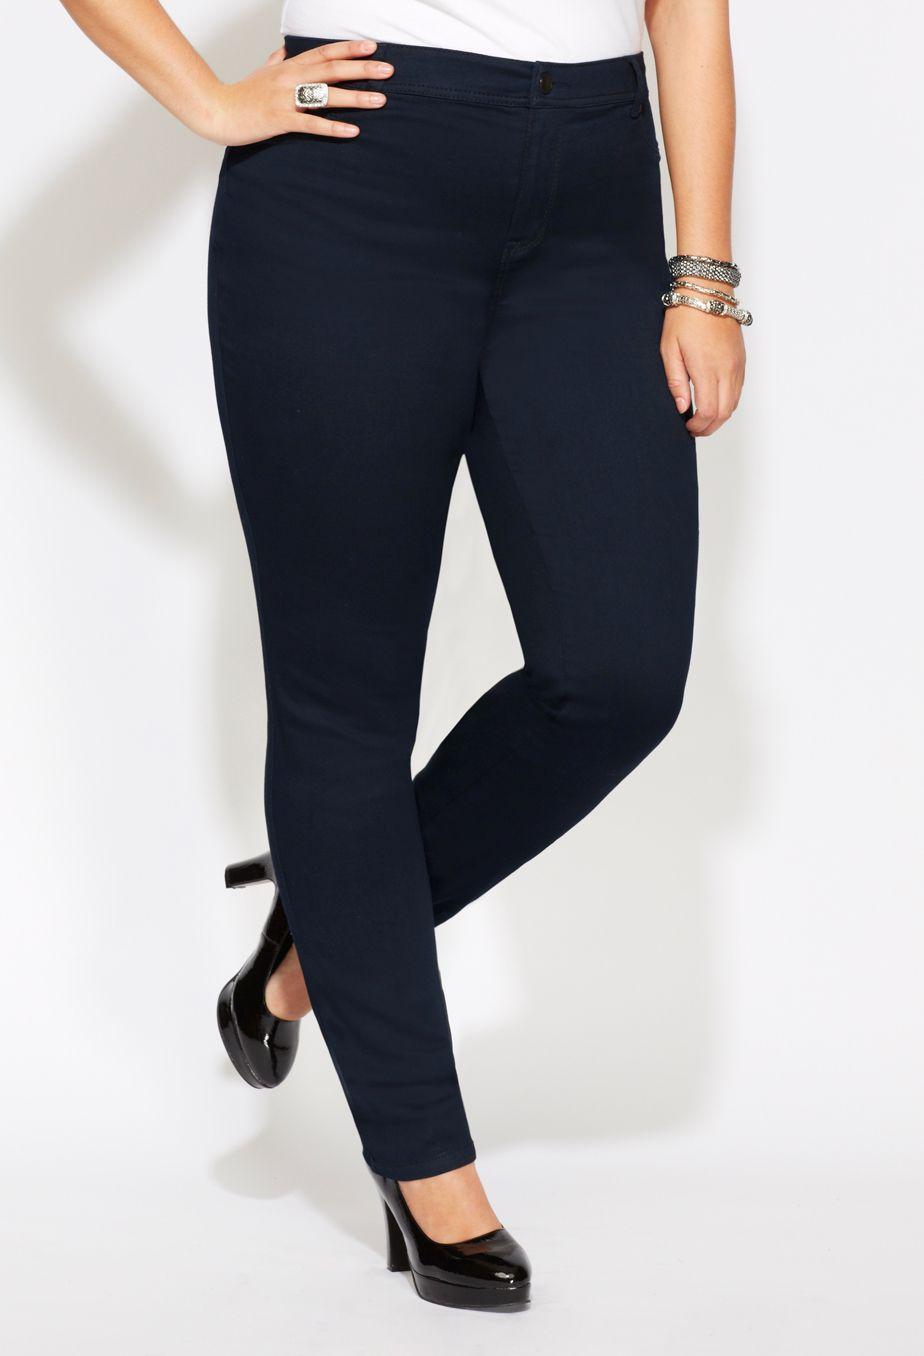 fb3225a267f99 Plus Size Tall Virtual Stretch™ Butter Slim Leg Jean $54   Curvy ...